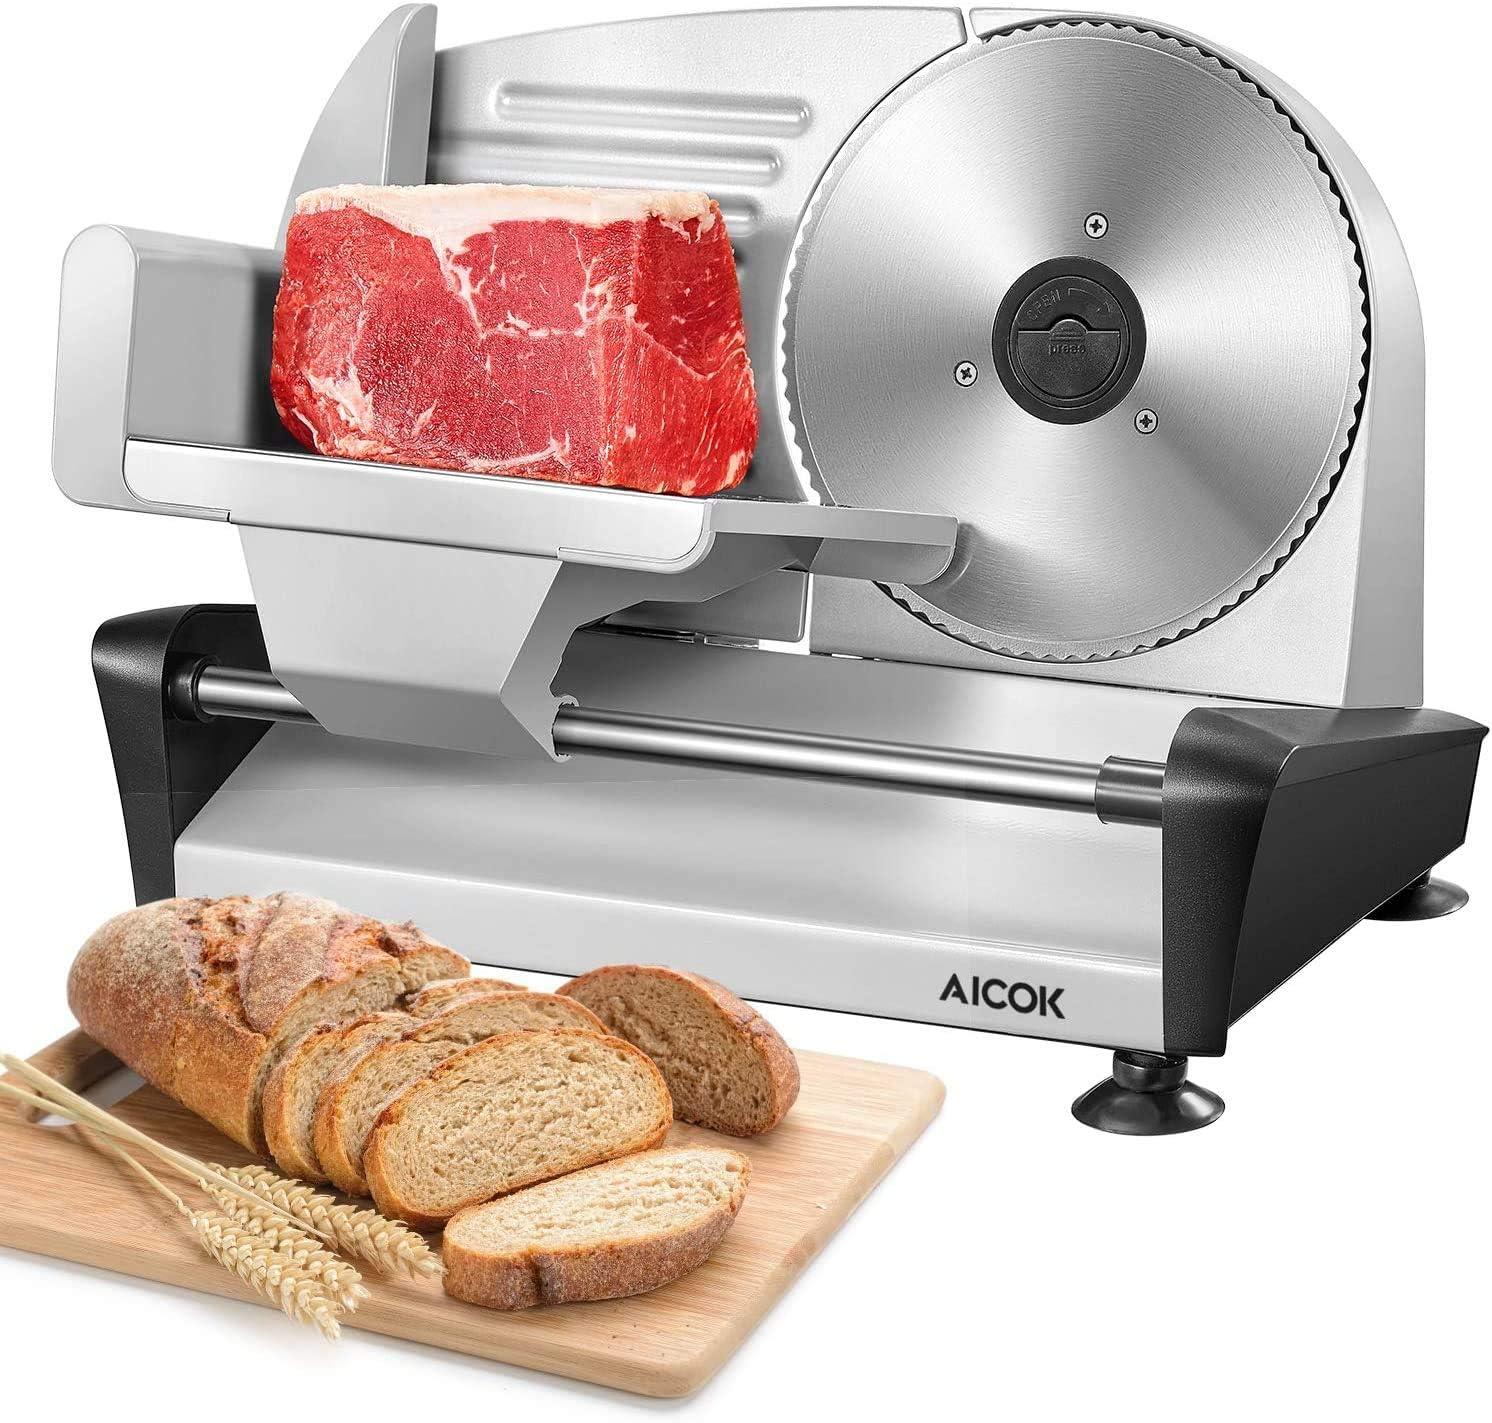 Cortafiambre Electrico, AICOK Maquina de Cortar Fiambre 150W, 19 cm Cuchillas de Acero Inoxidable para Embutido o Pan, Plateado